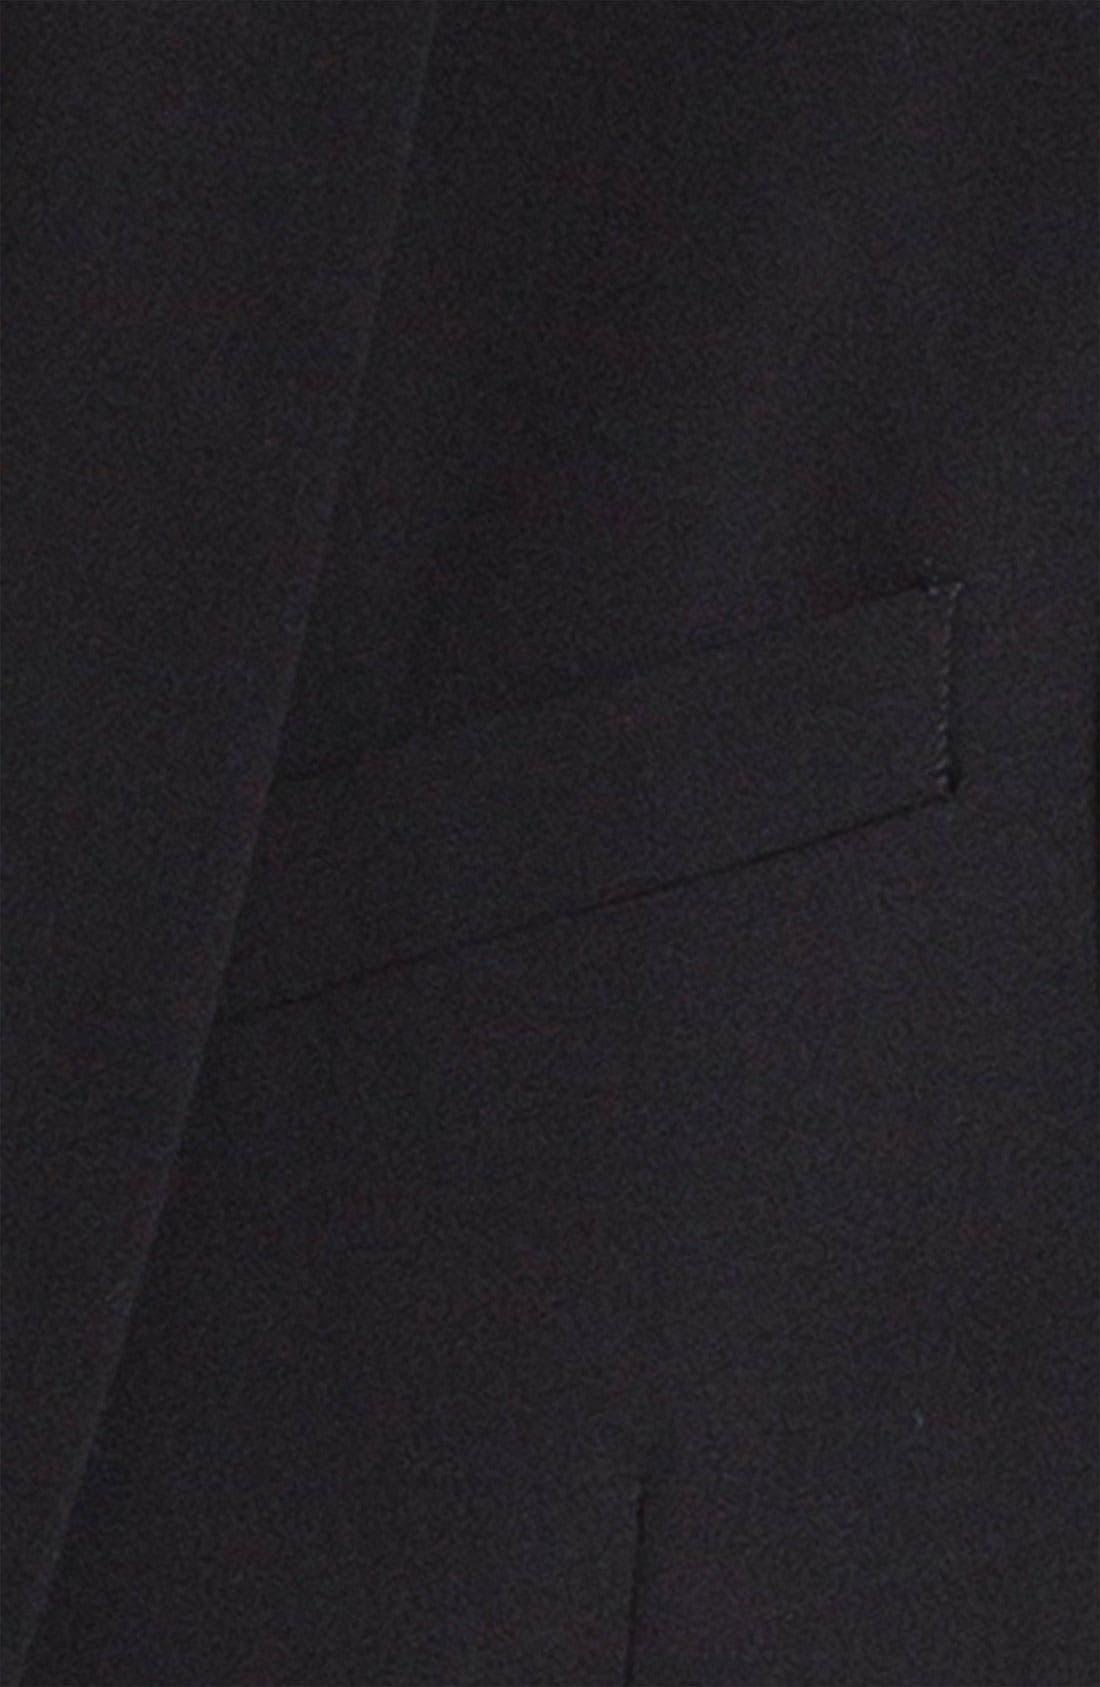 'Dwell 2' Black Wool Blazer,                             Alternate thumbnail 5, color,                             001